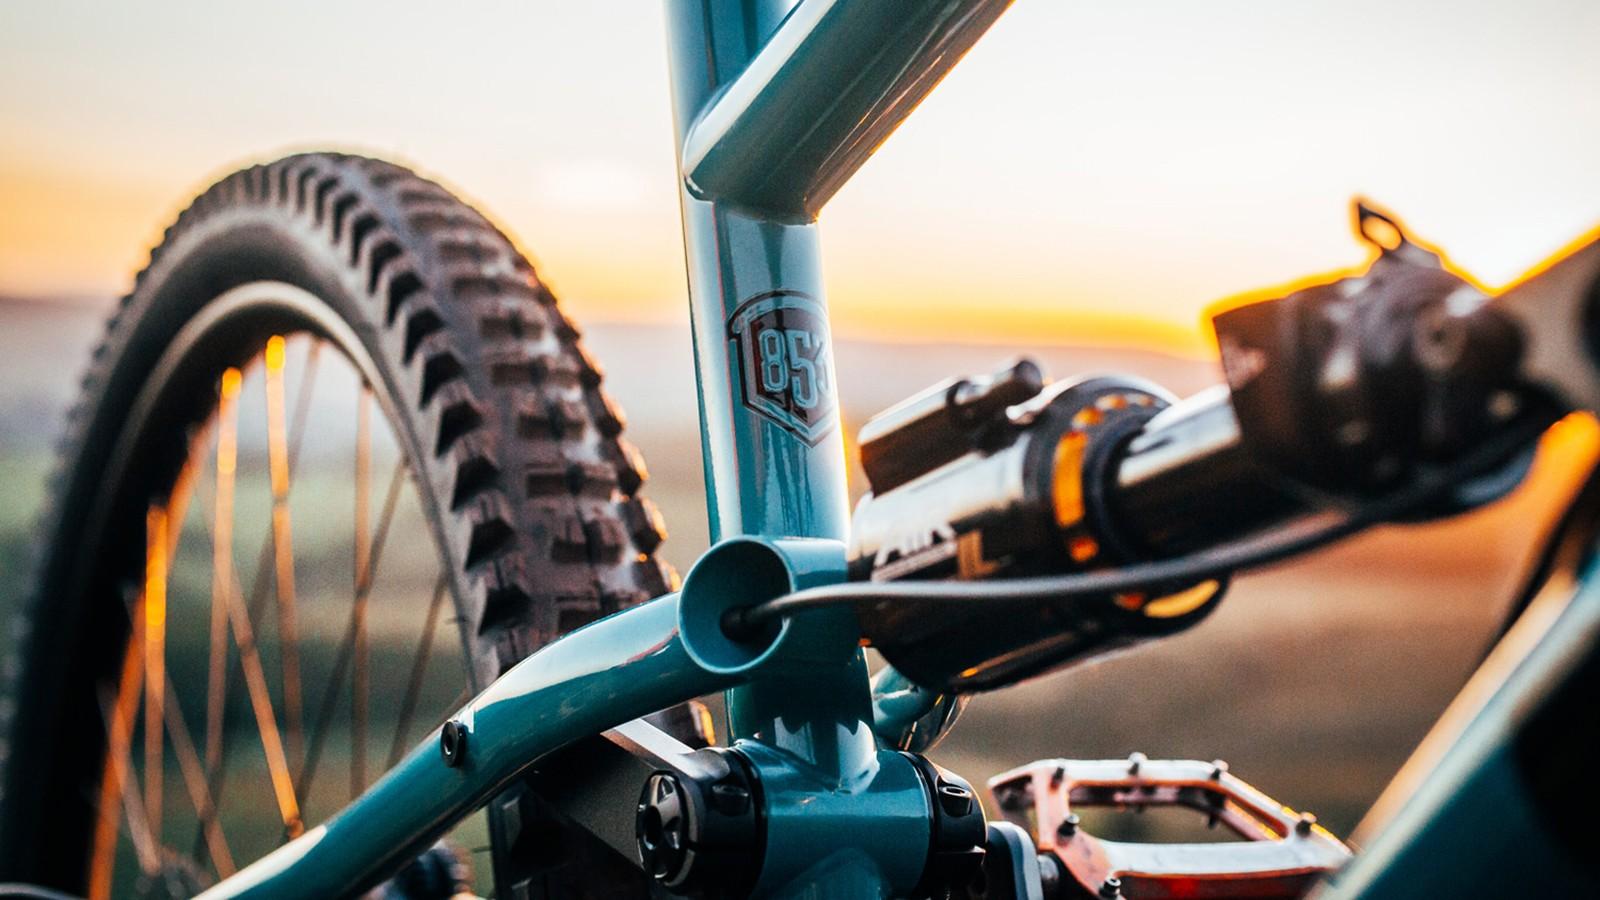 The single pivot Droplink suspension design